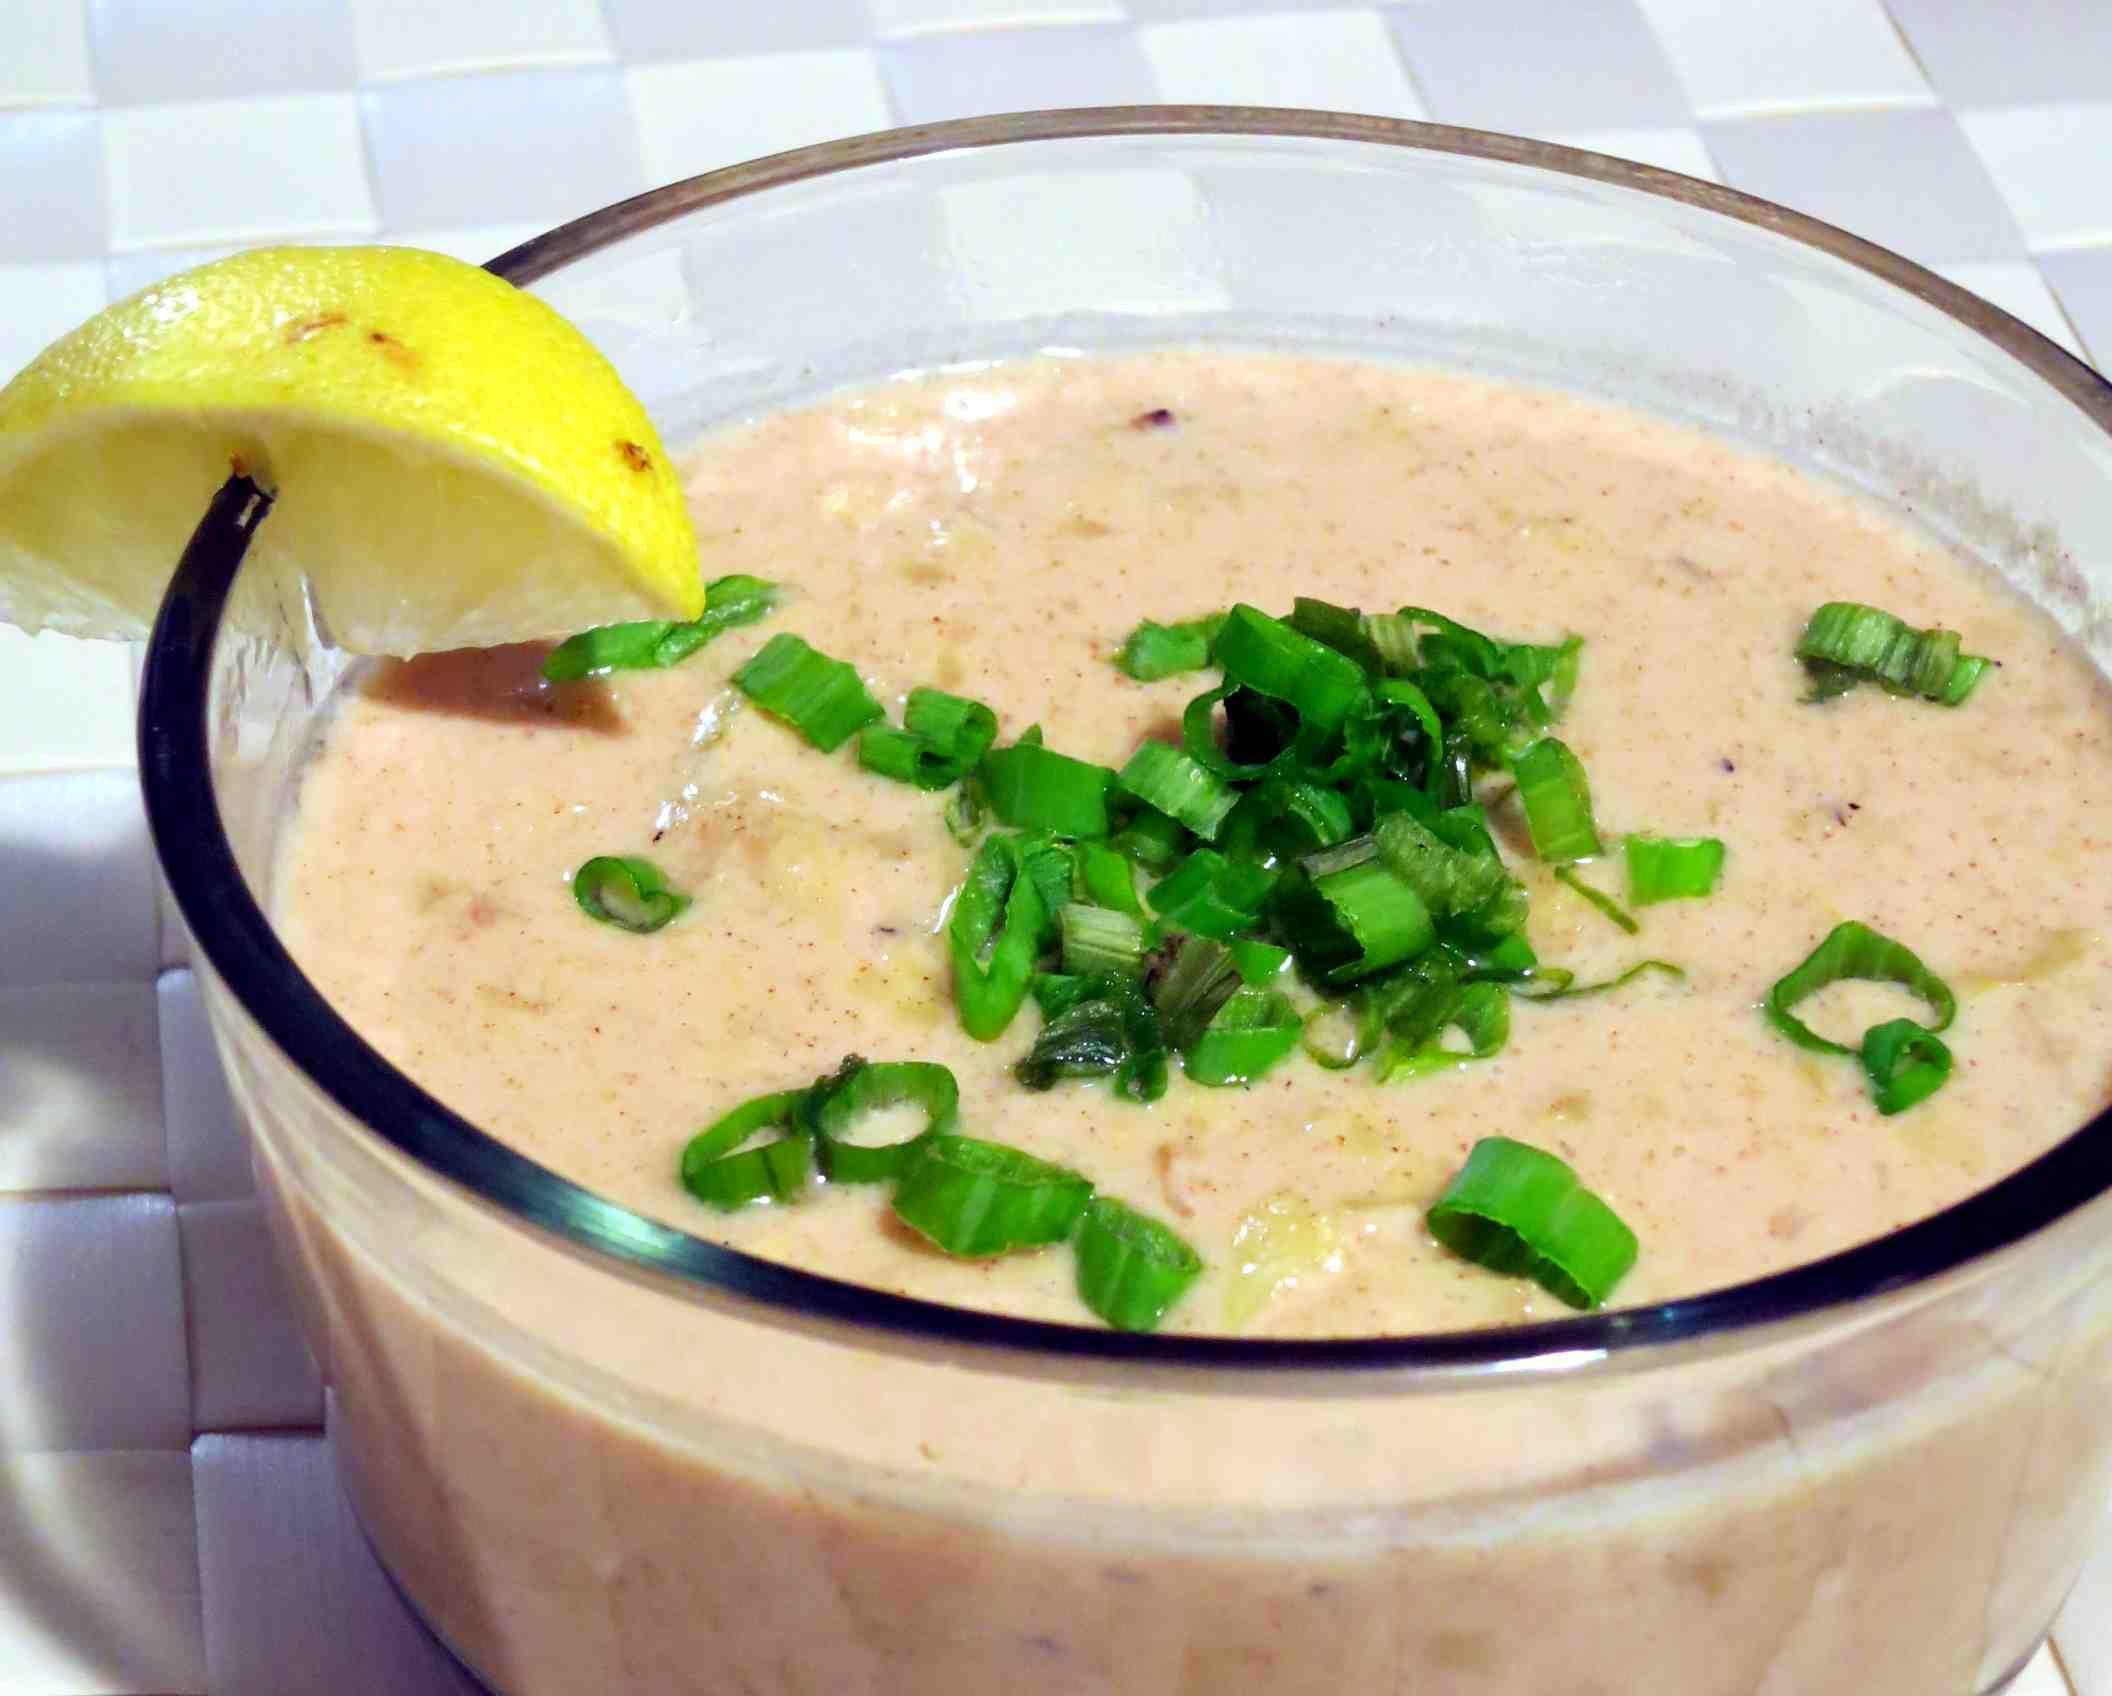 Coconut Artichoke Sauce